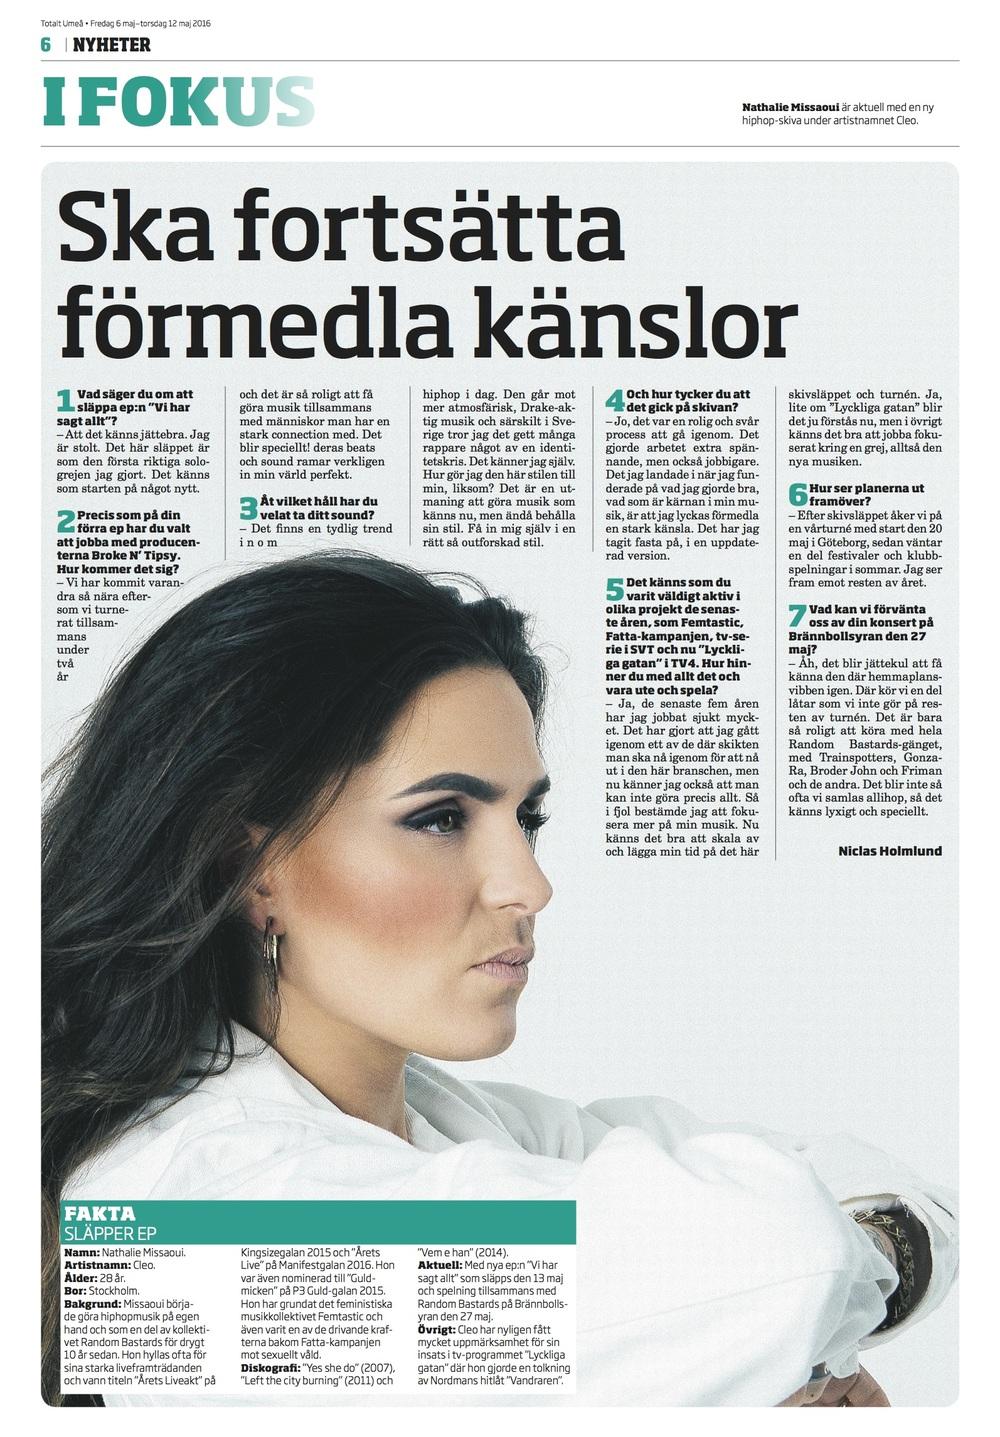 Totalt Umeå intervju - Cleo.jpg